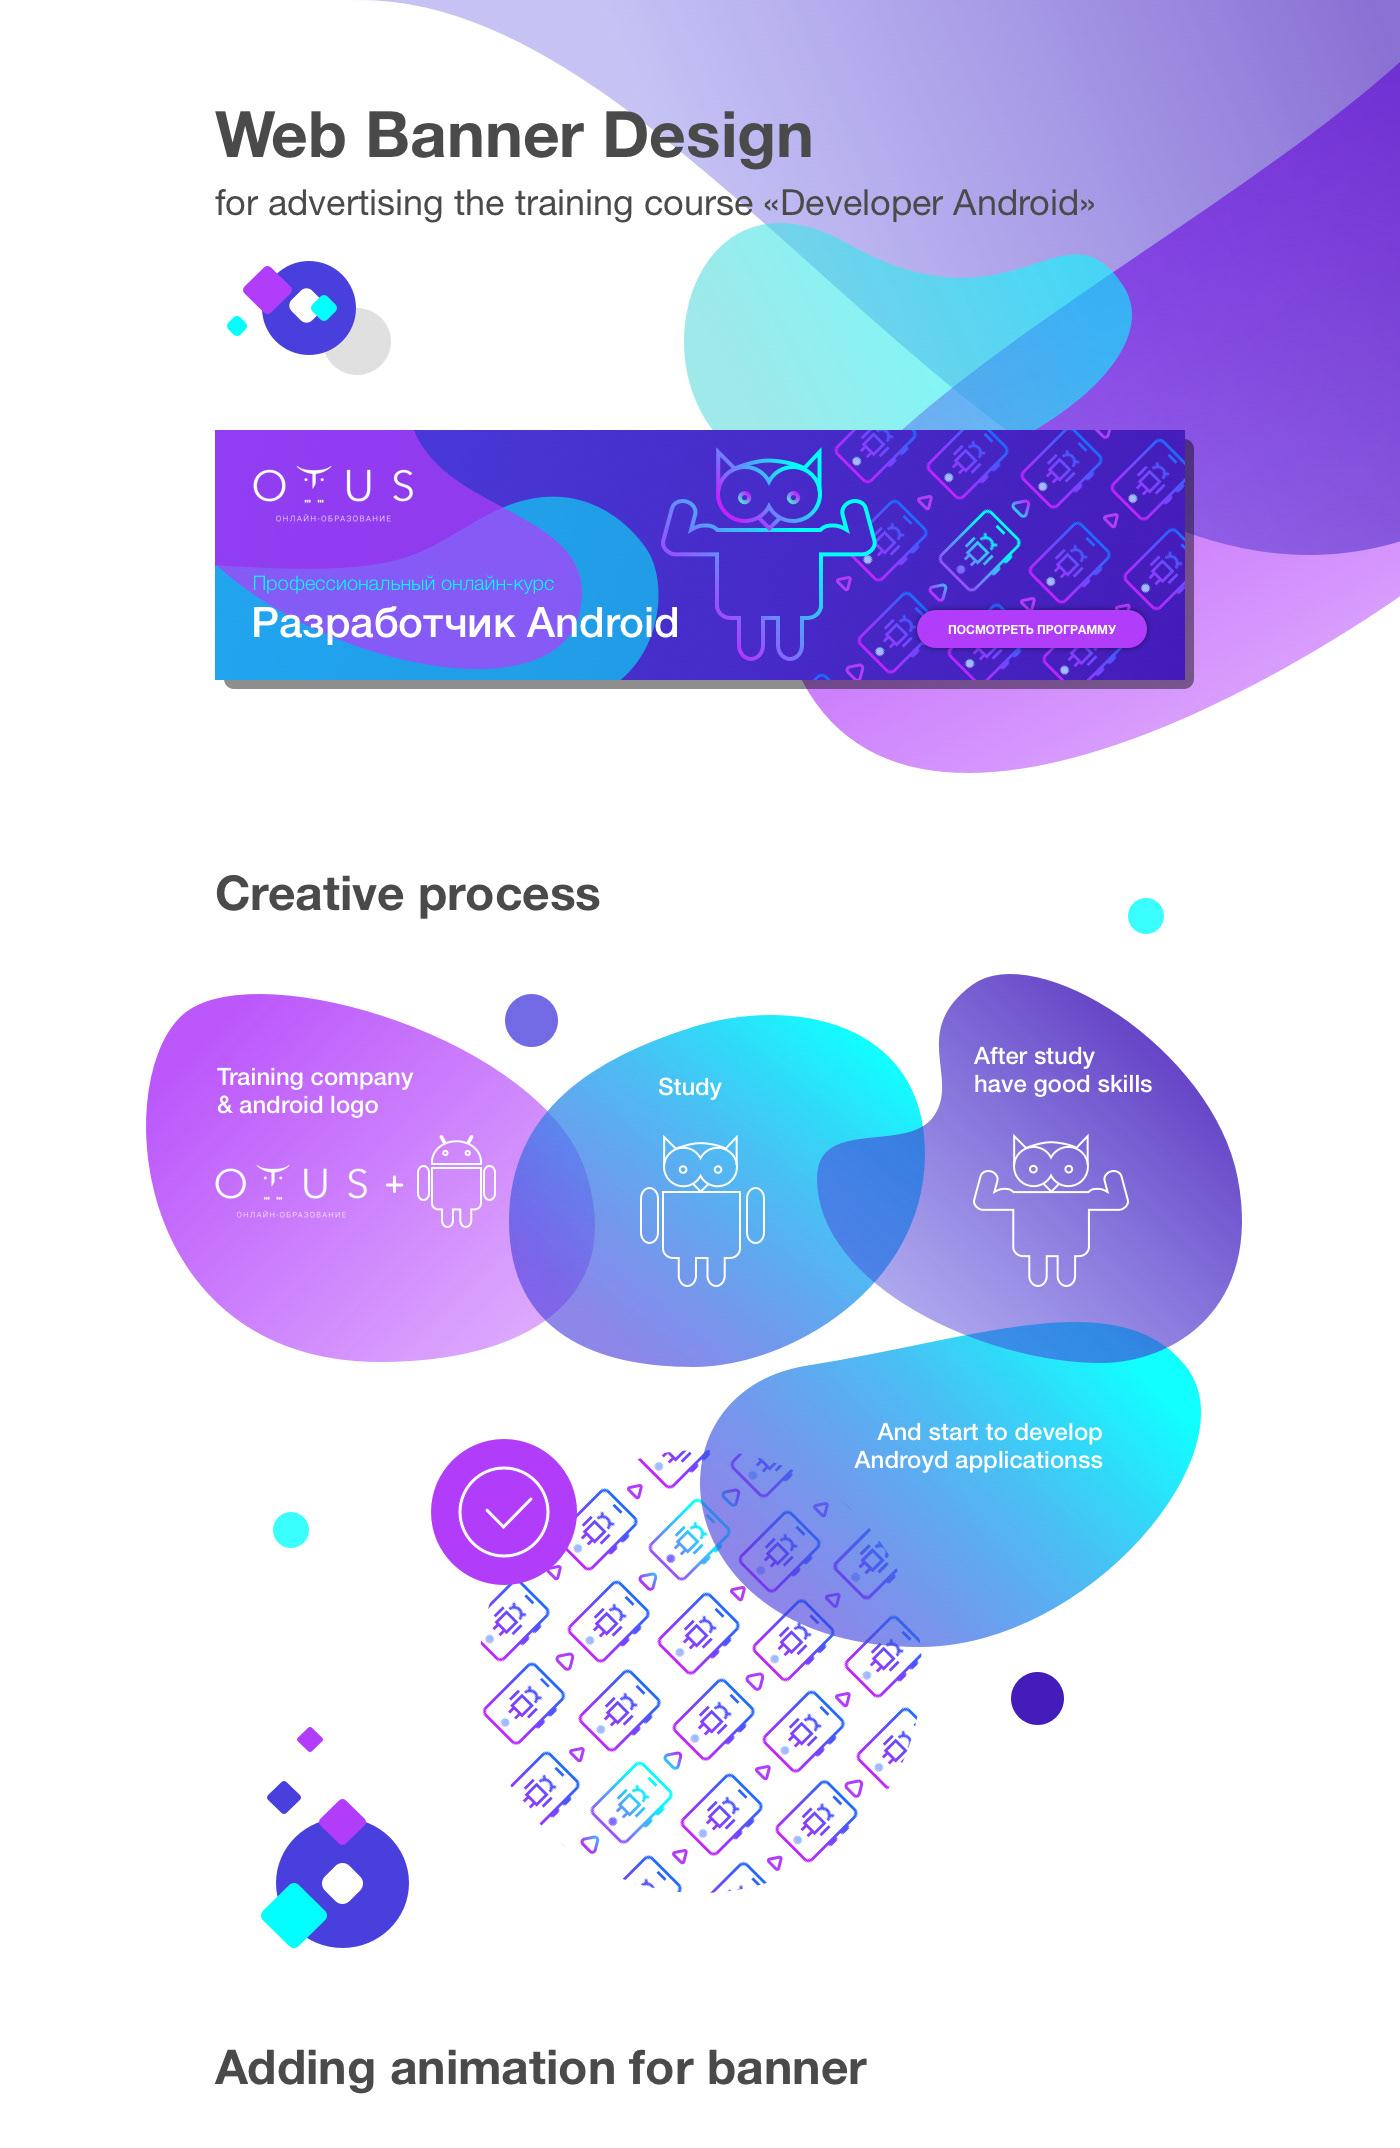 анимация Web animation  banner design banner banner animation Web Design  android training courses android developer